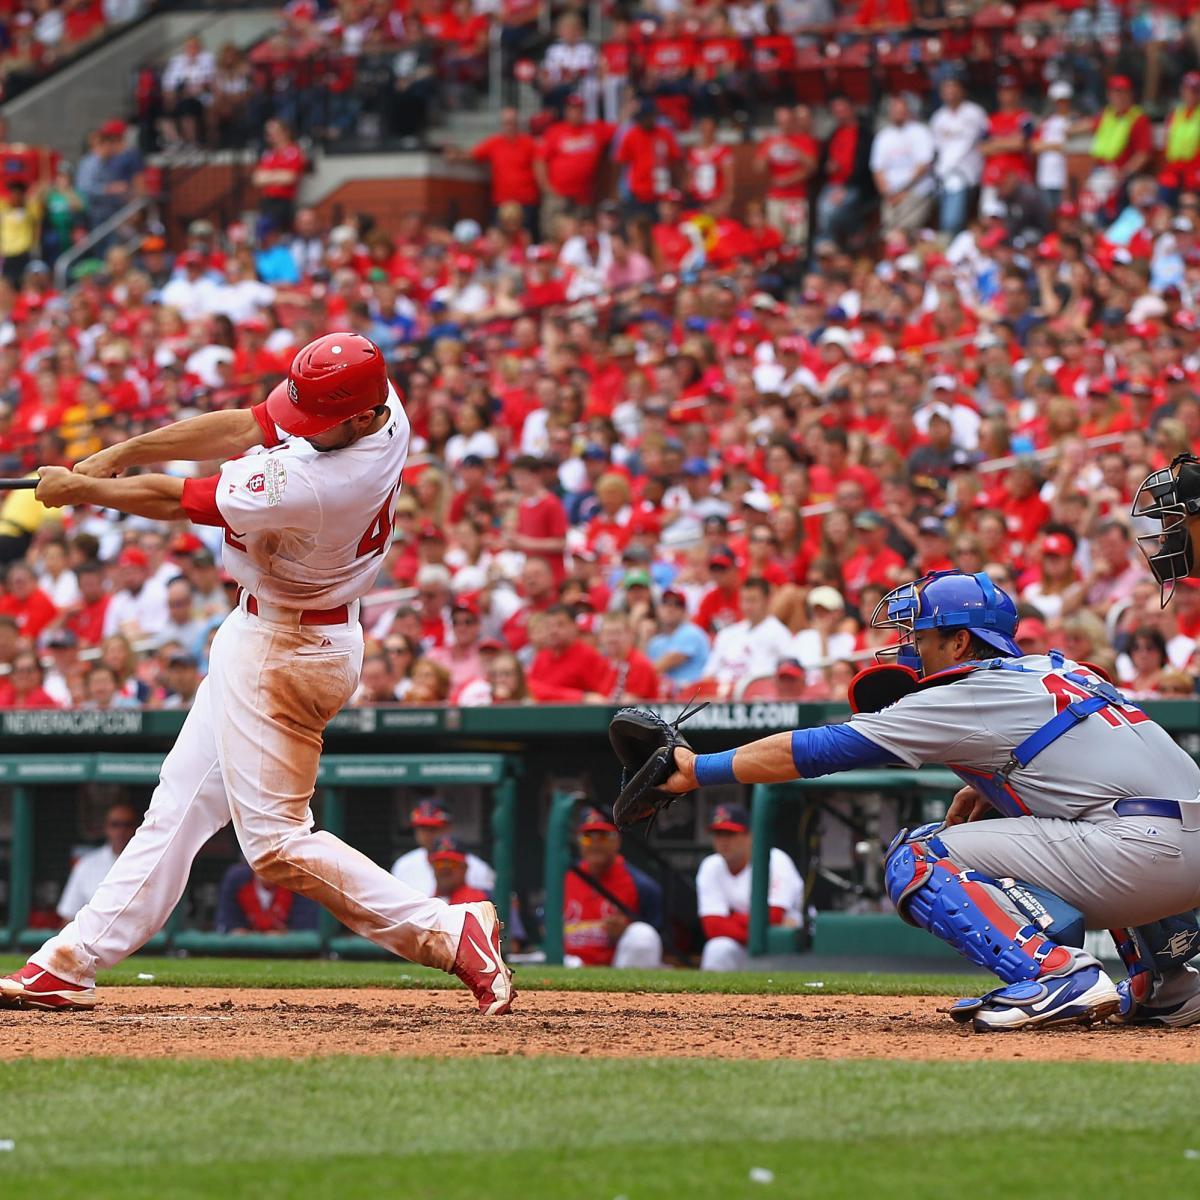 cubs cardinals vs baseball mlb rivalry bleacherreport highlights